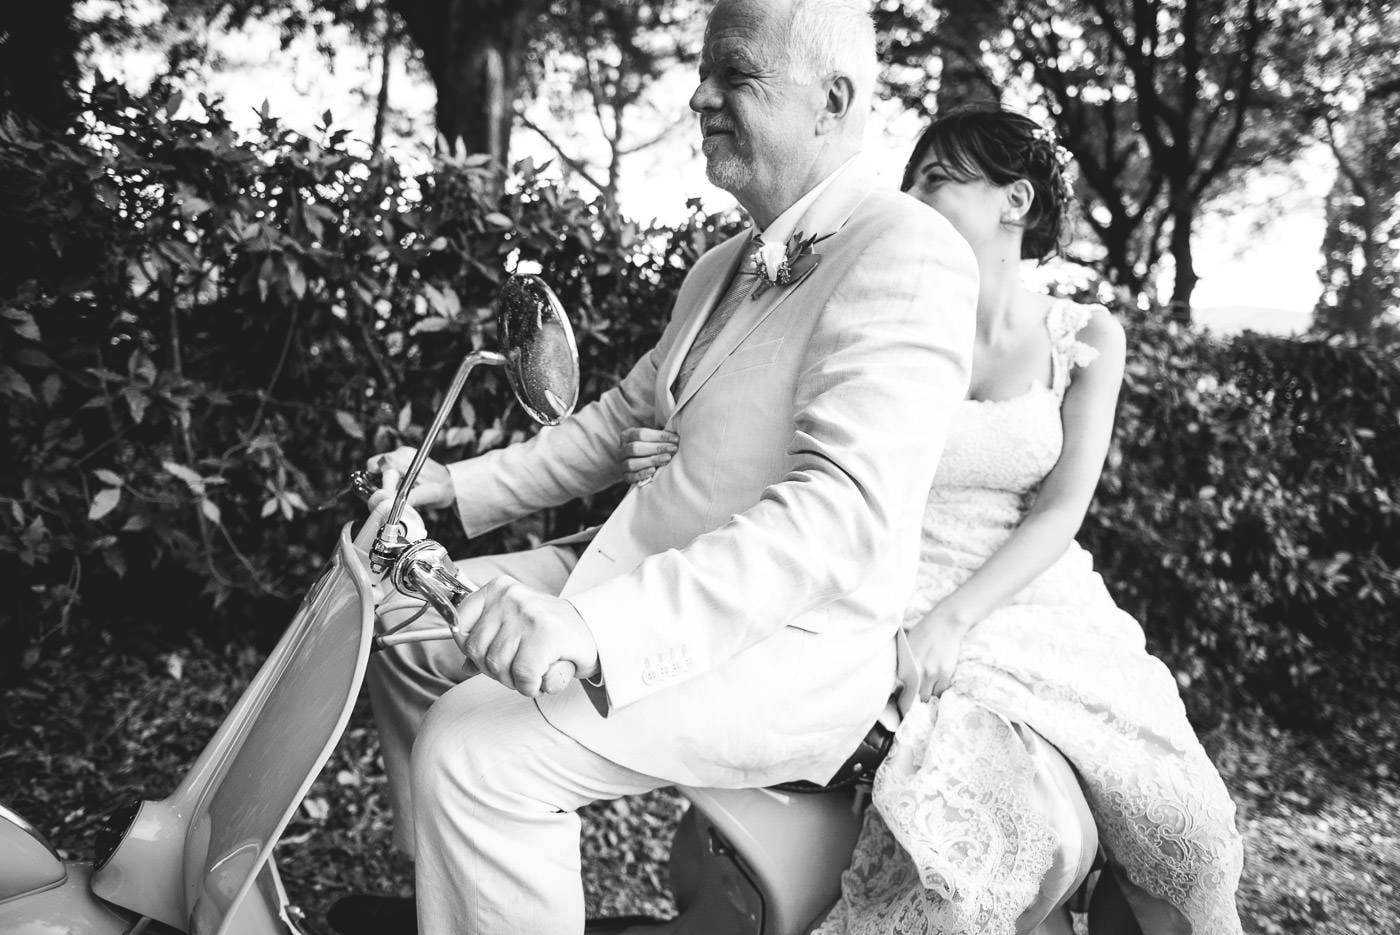 Matrimonio Giulia & Federico 09_15 – Alessio Nobili Photographer-22